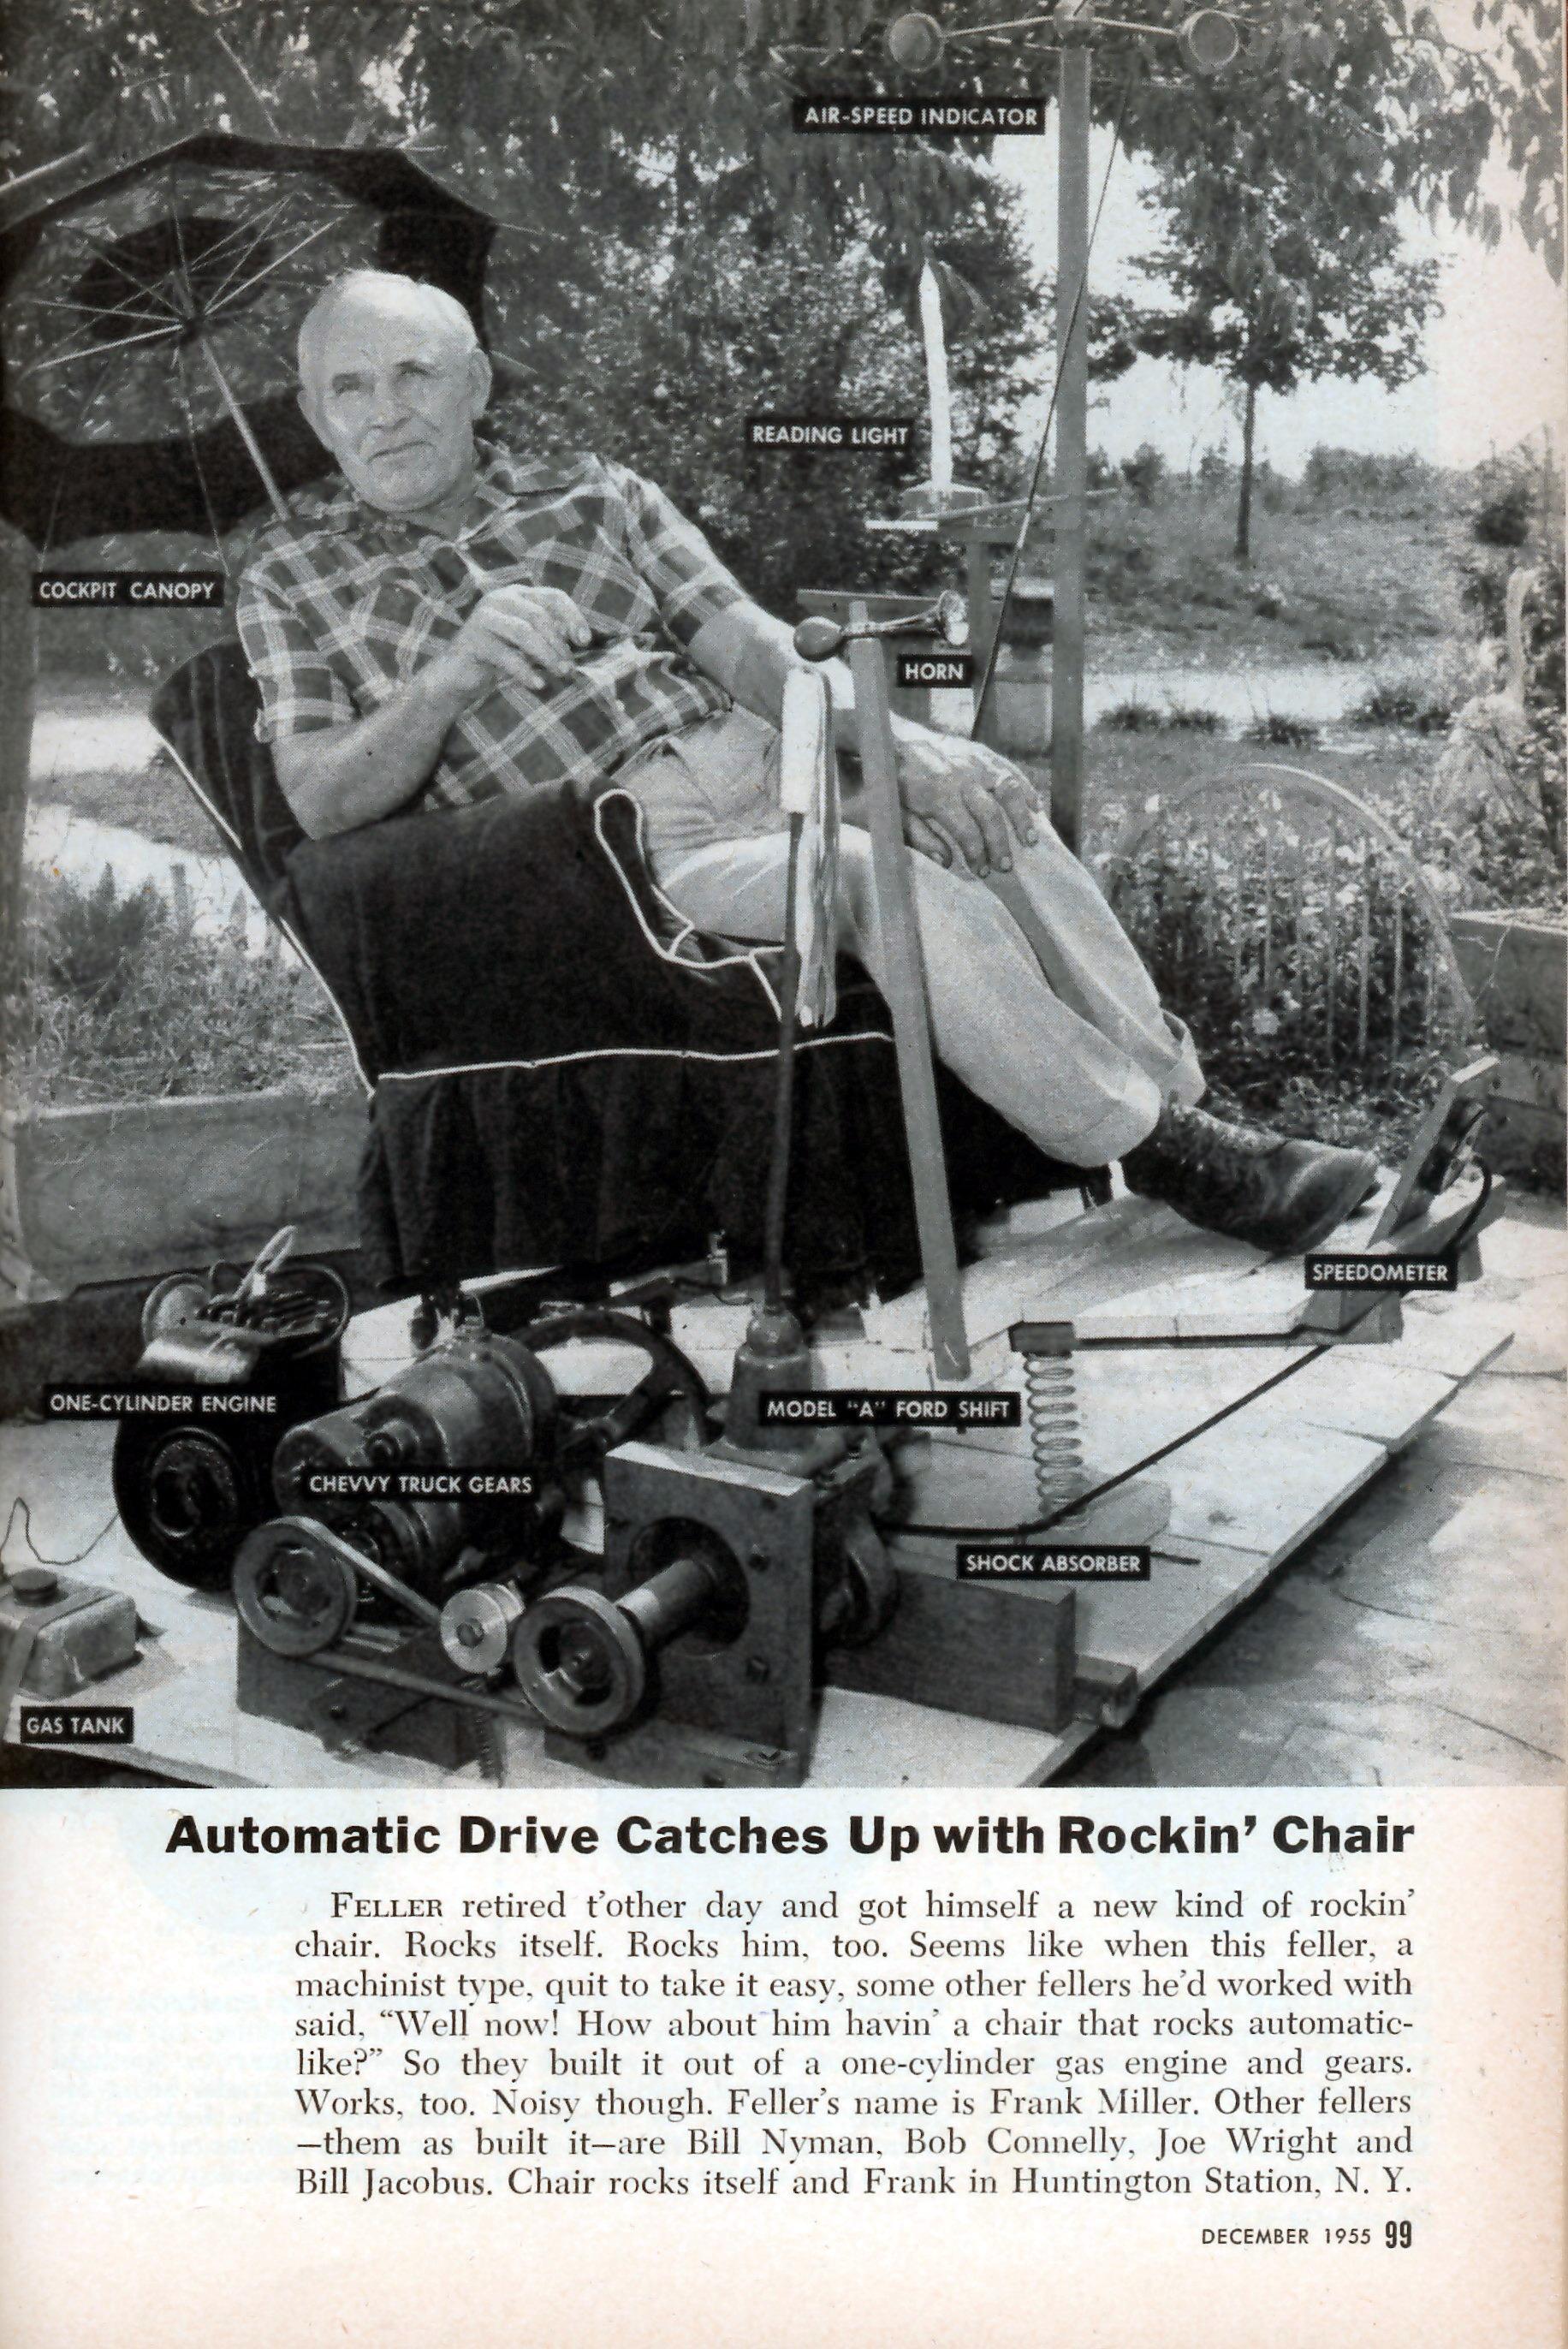 Motorized Rocking Chair